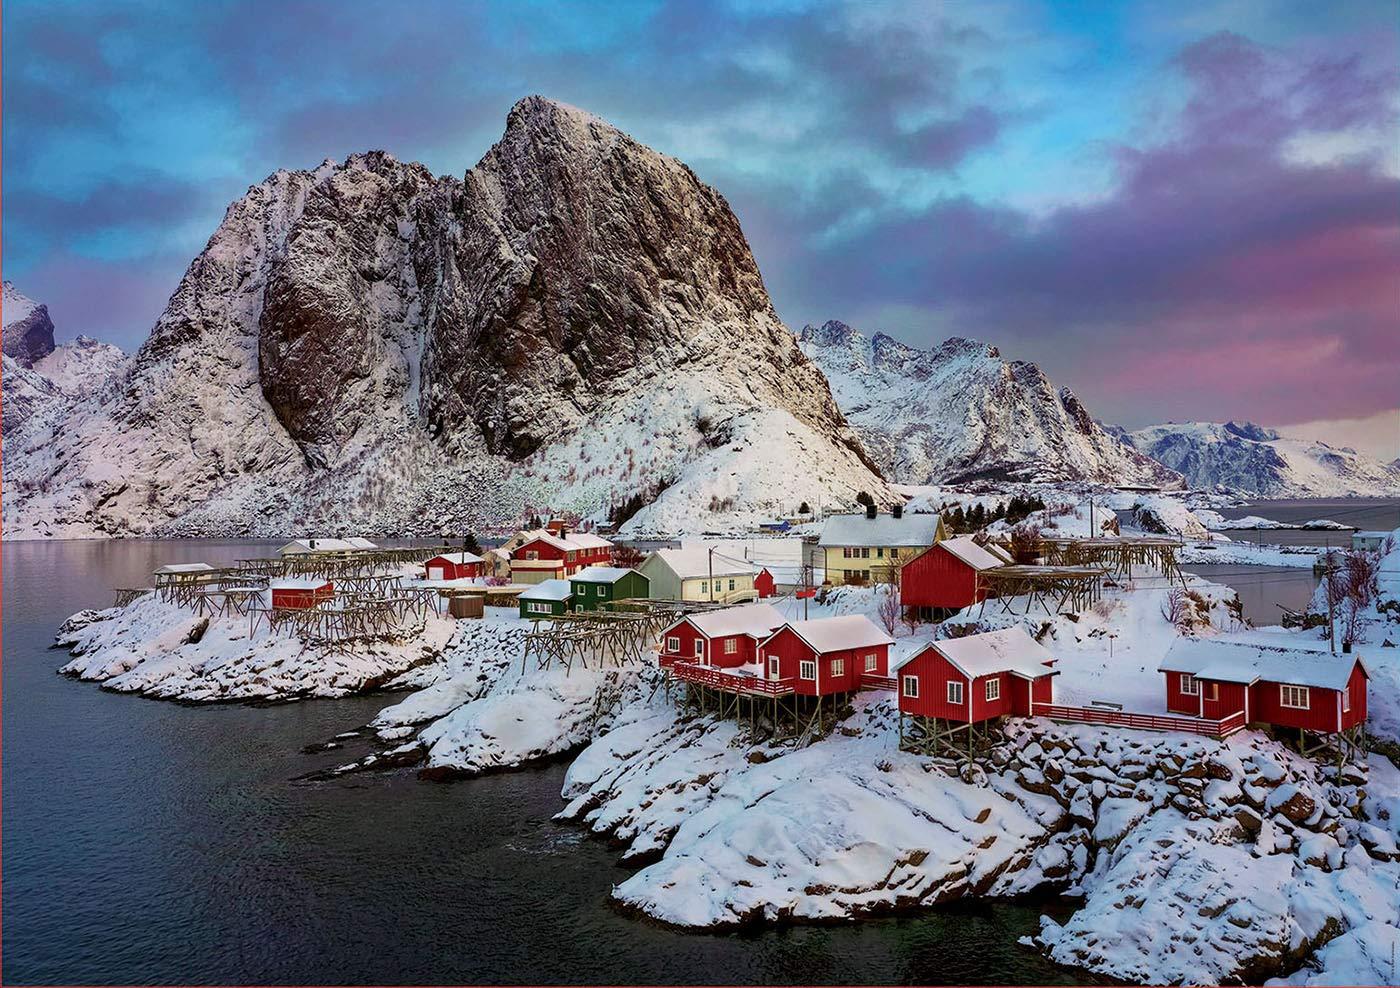 LOFOTEN ISLANDS NORWAY 1500 PIECE JIGSAW PUZZLE - EDUCA